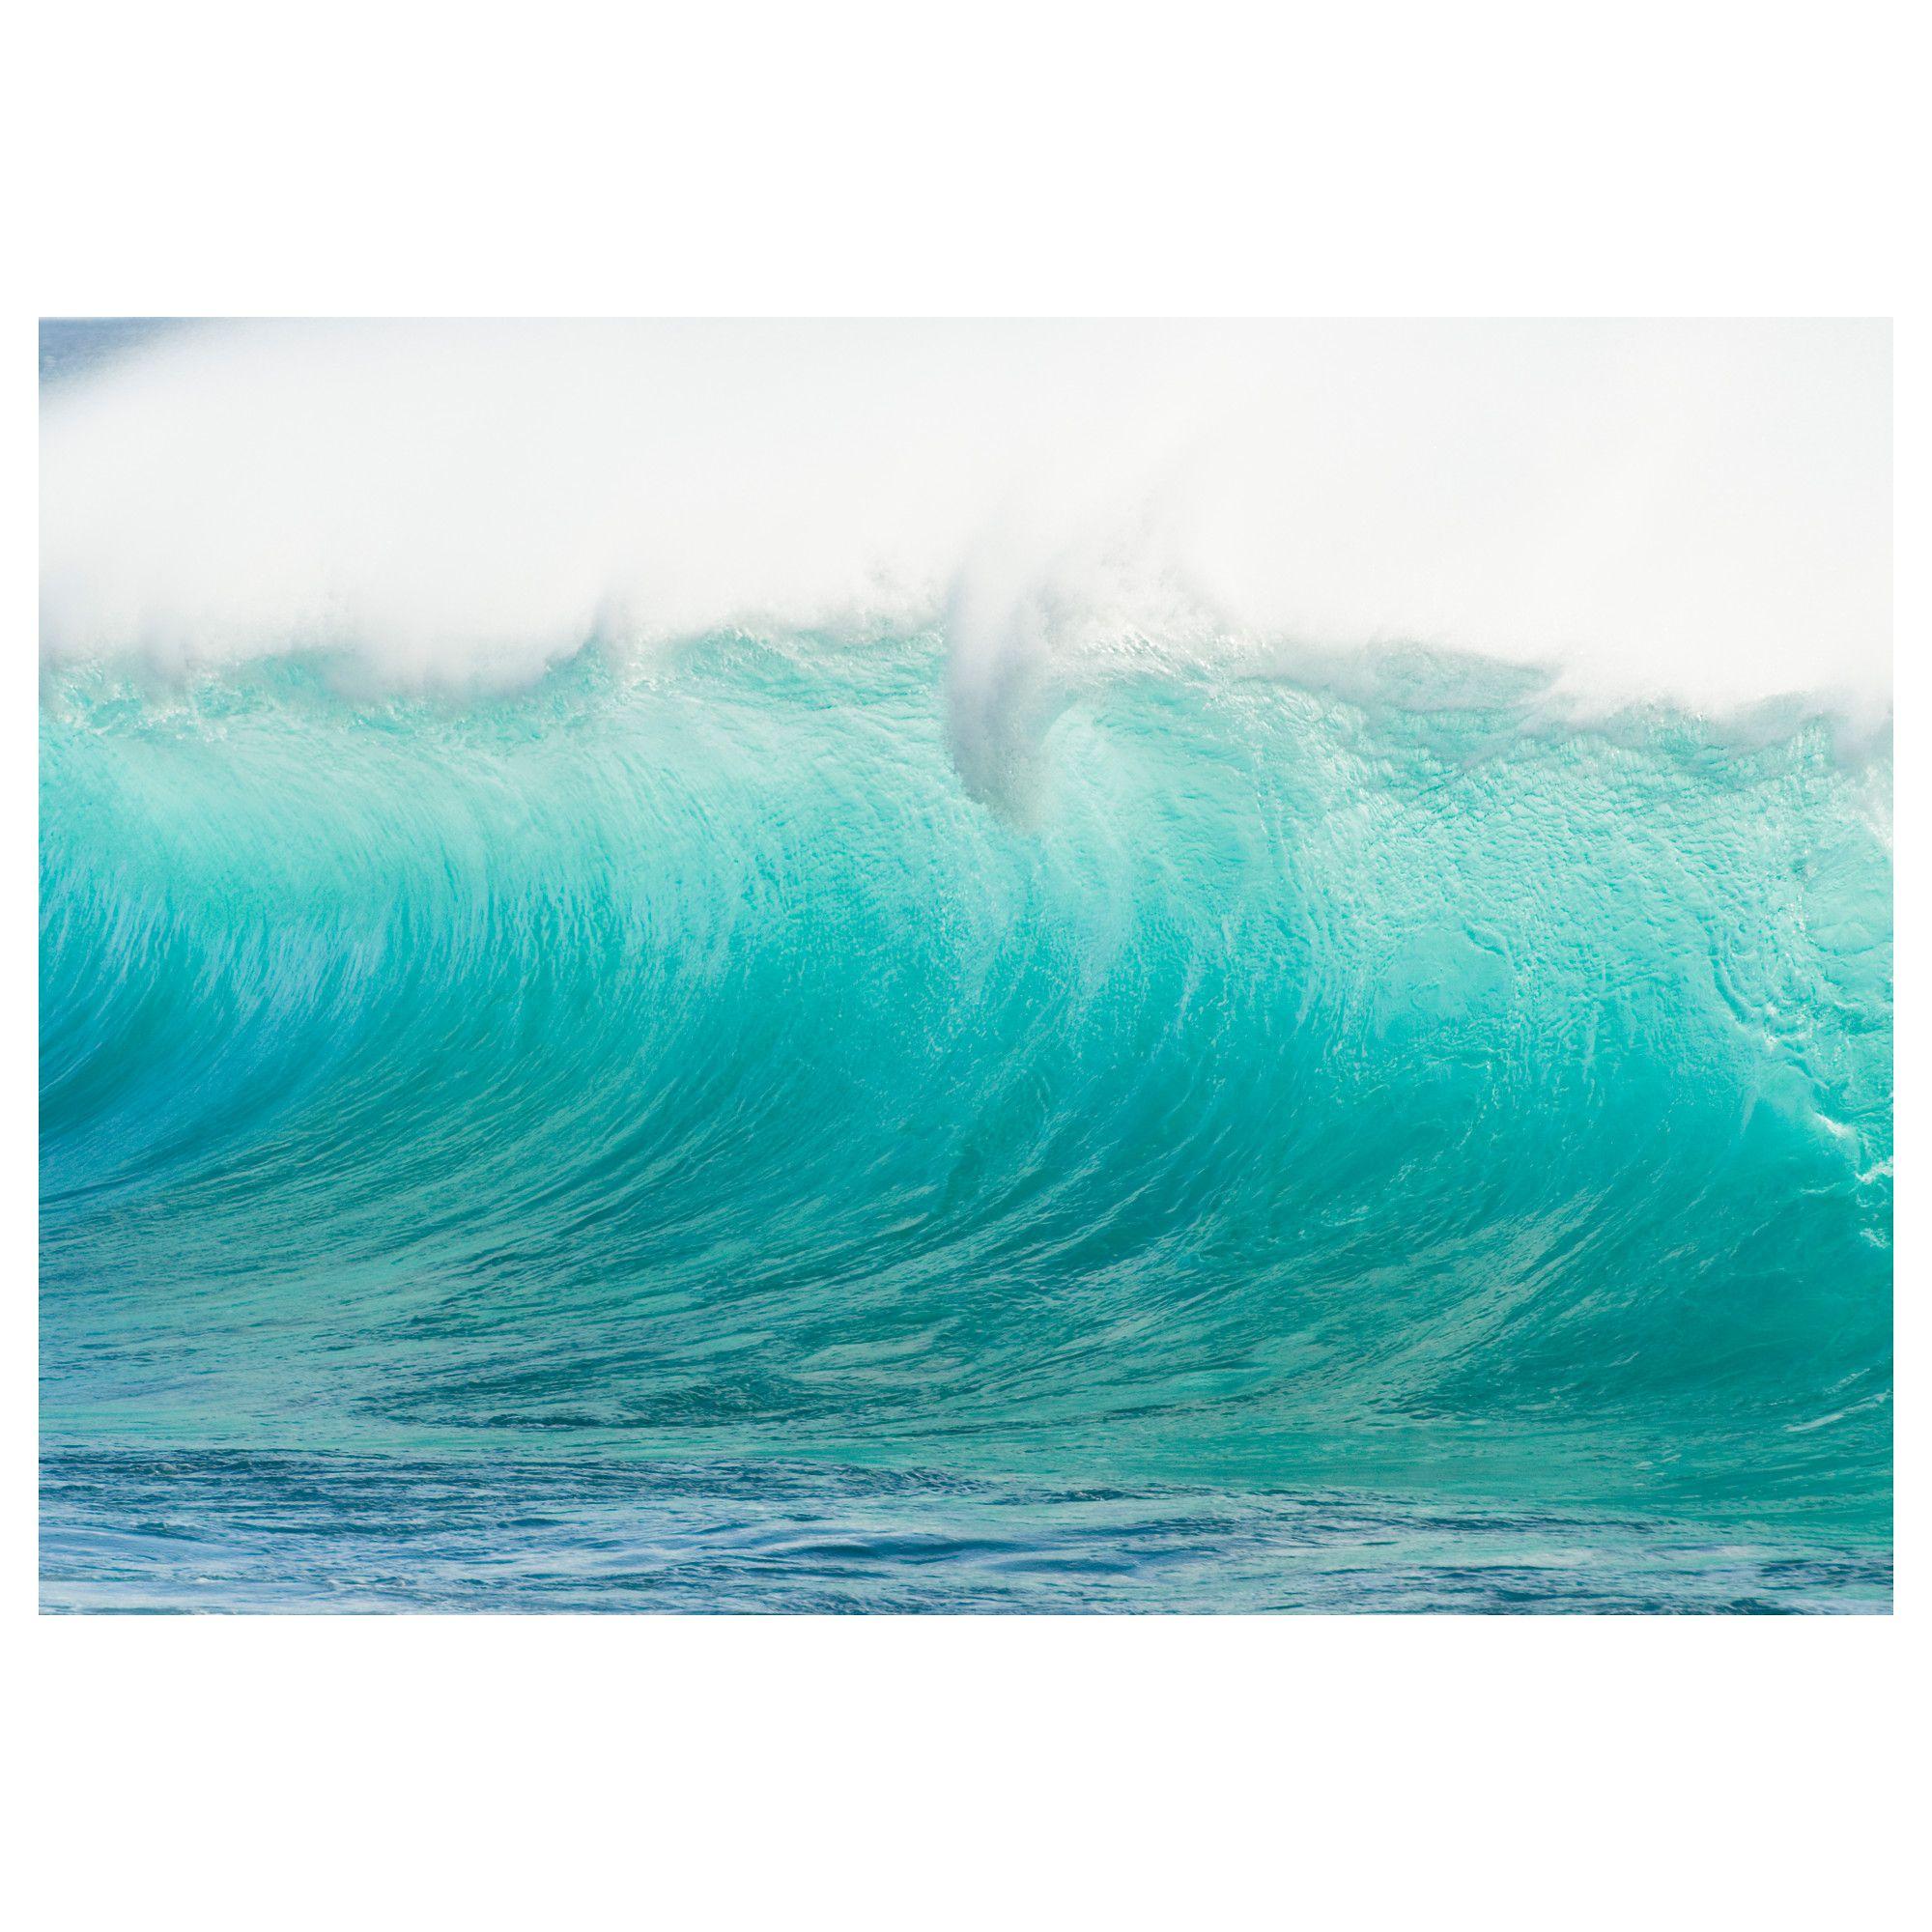 ikea premiar motif waves hawaii by mark a johnson 149